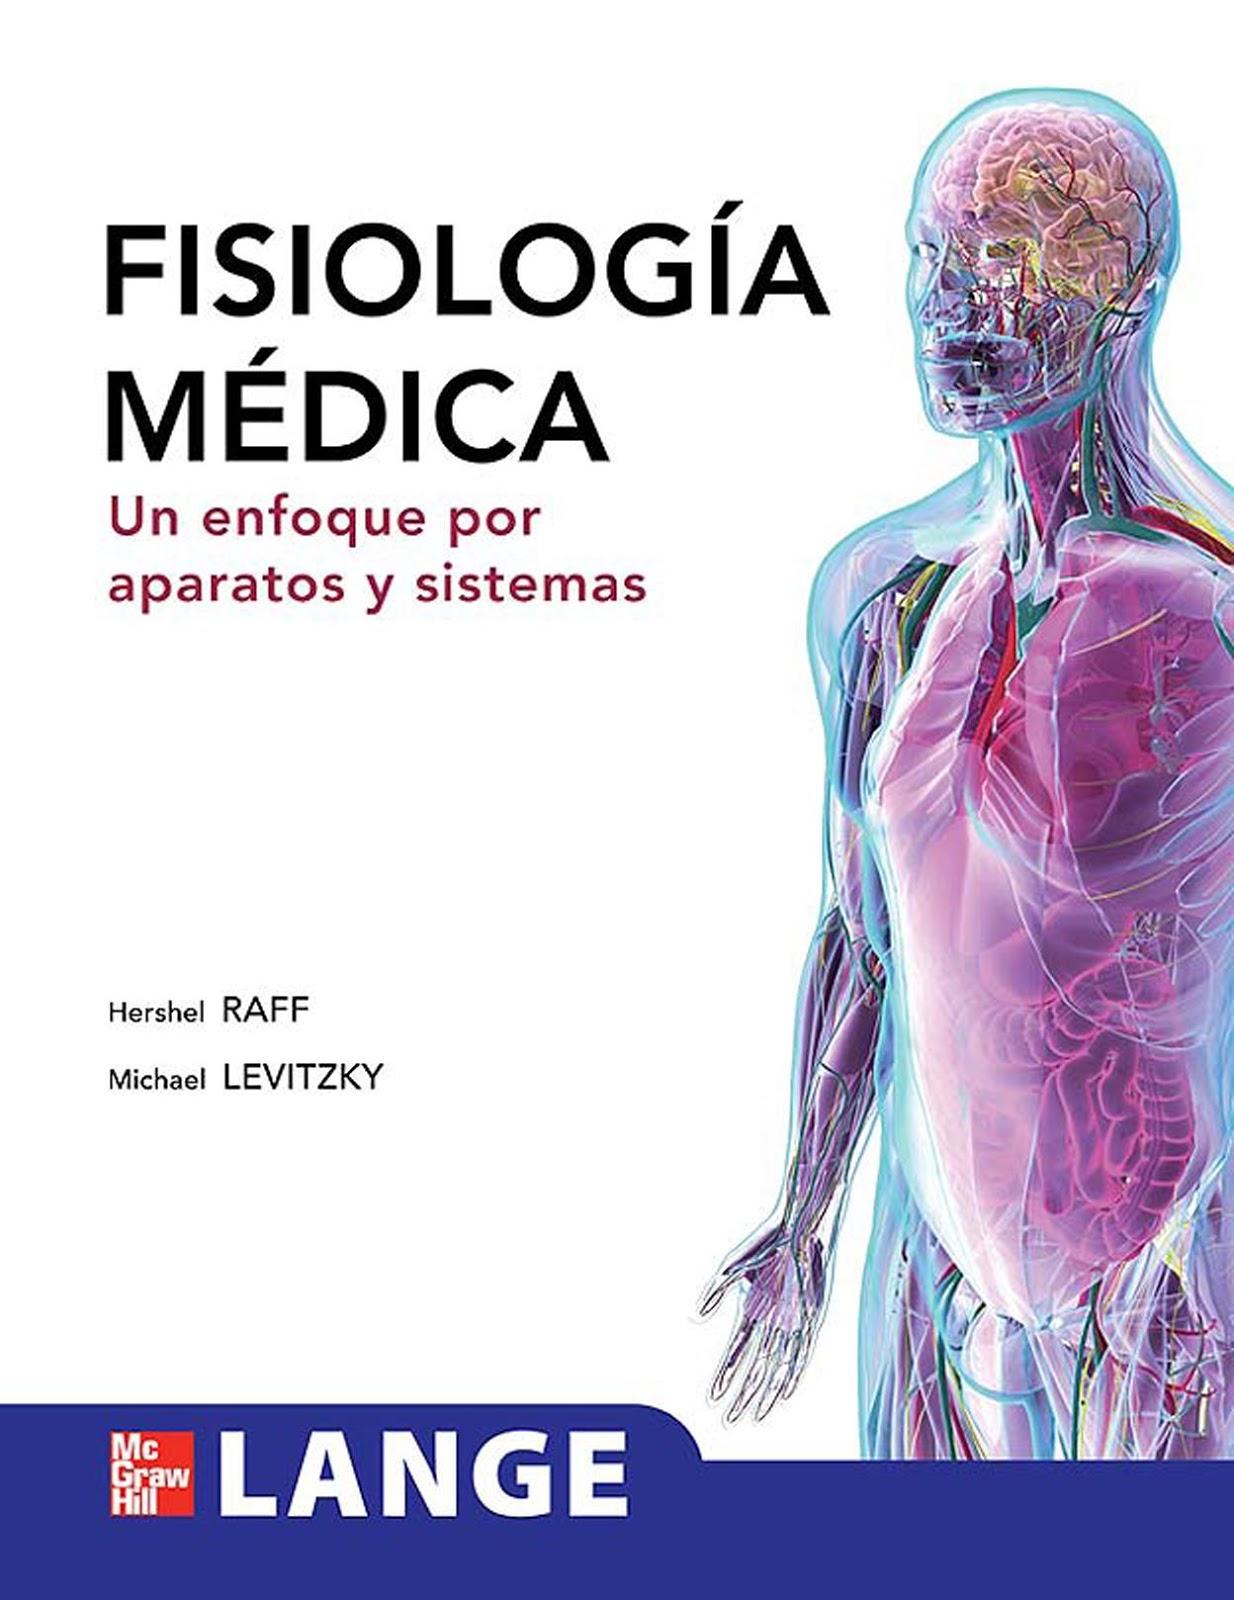 Fisiología médica - Hershel Raff | LibrosVirtual